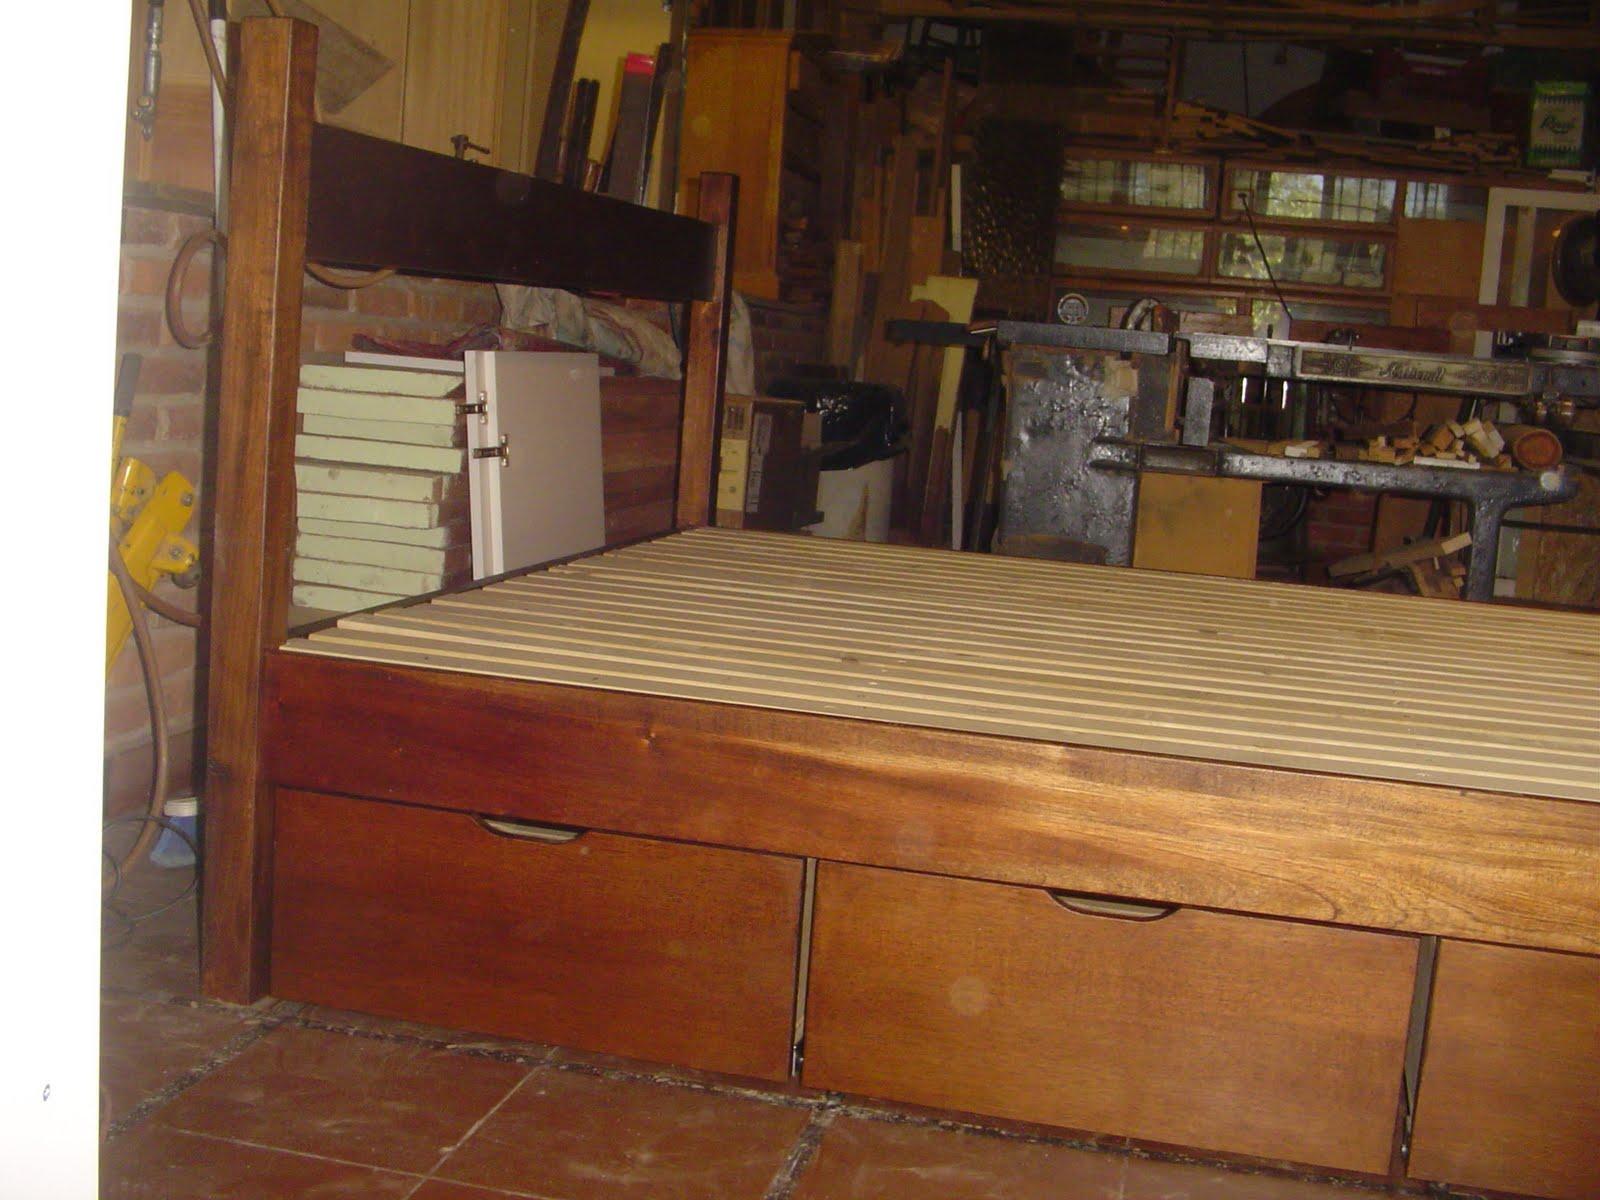 Tapa carpintero camas for Dintel de madera